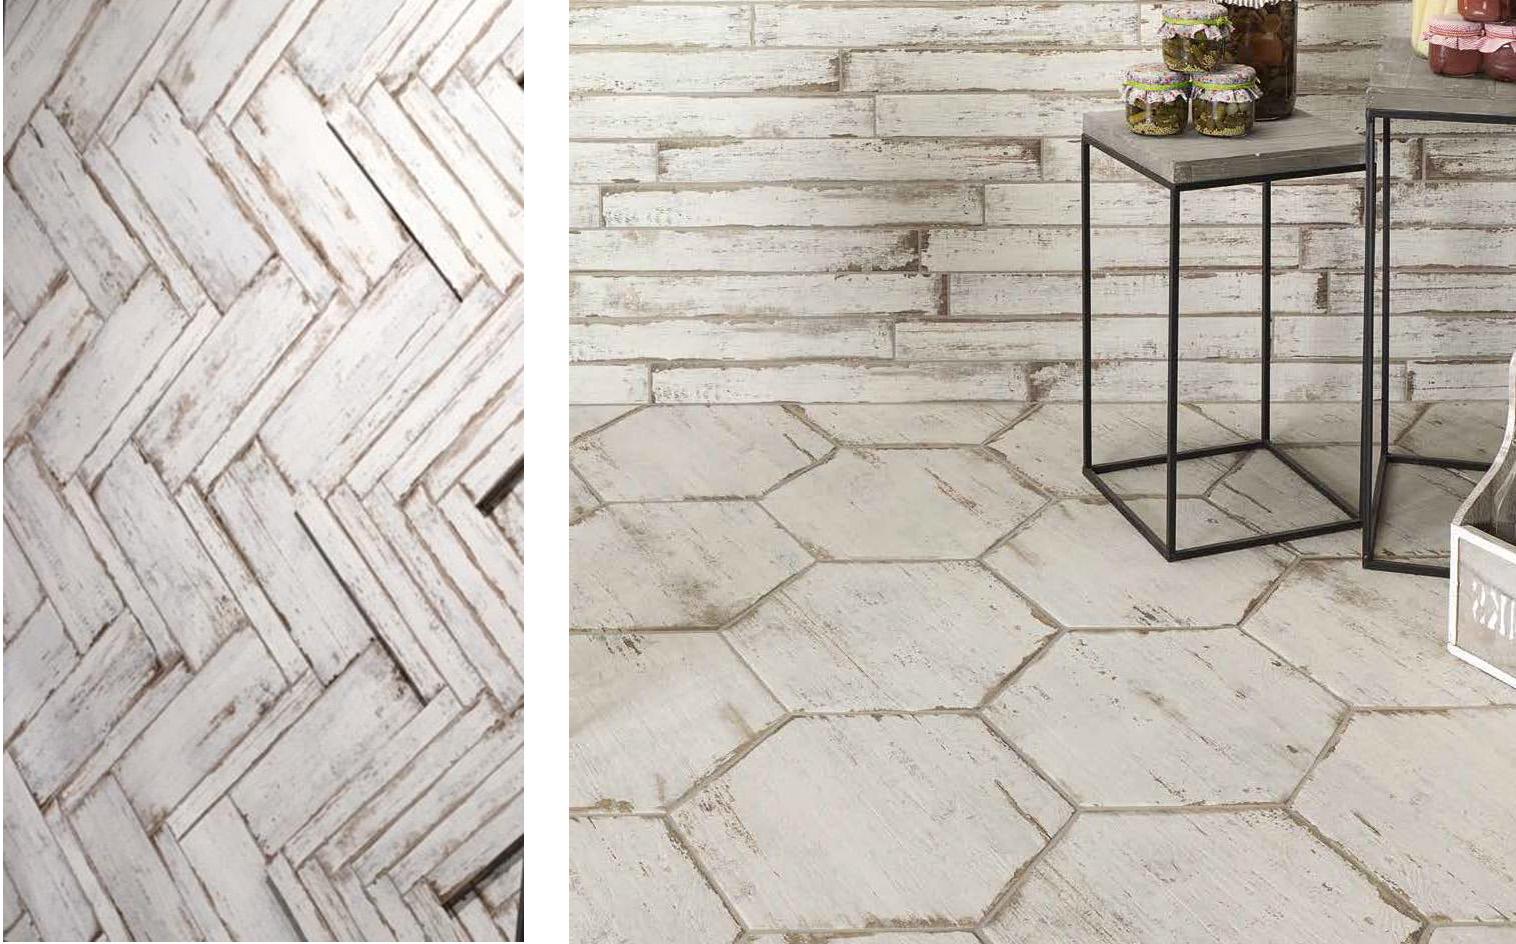 Adding new tile collections soci vintage blanc image 4 dailygadgetfo Choice Image